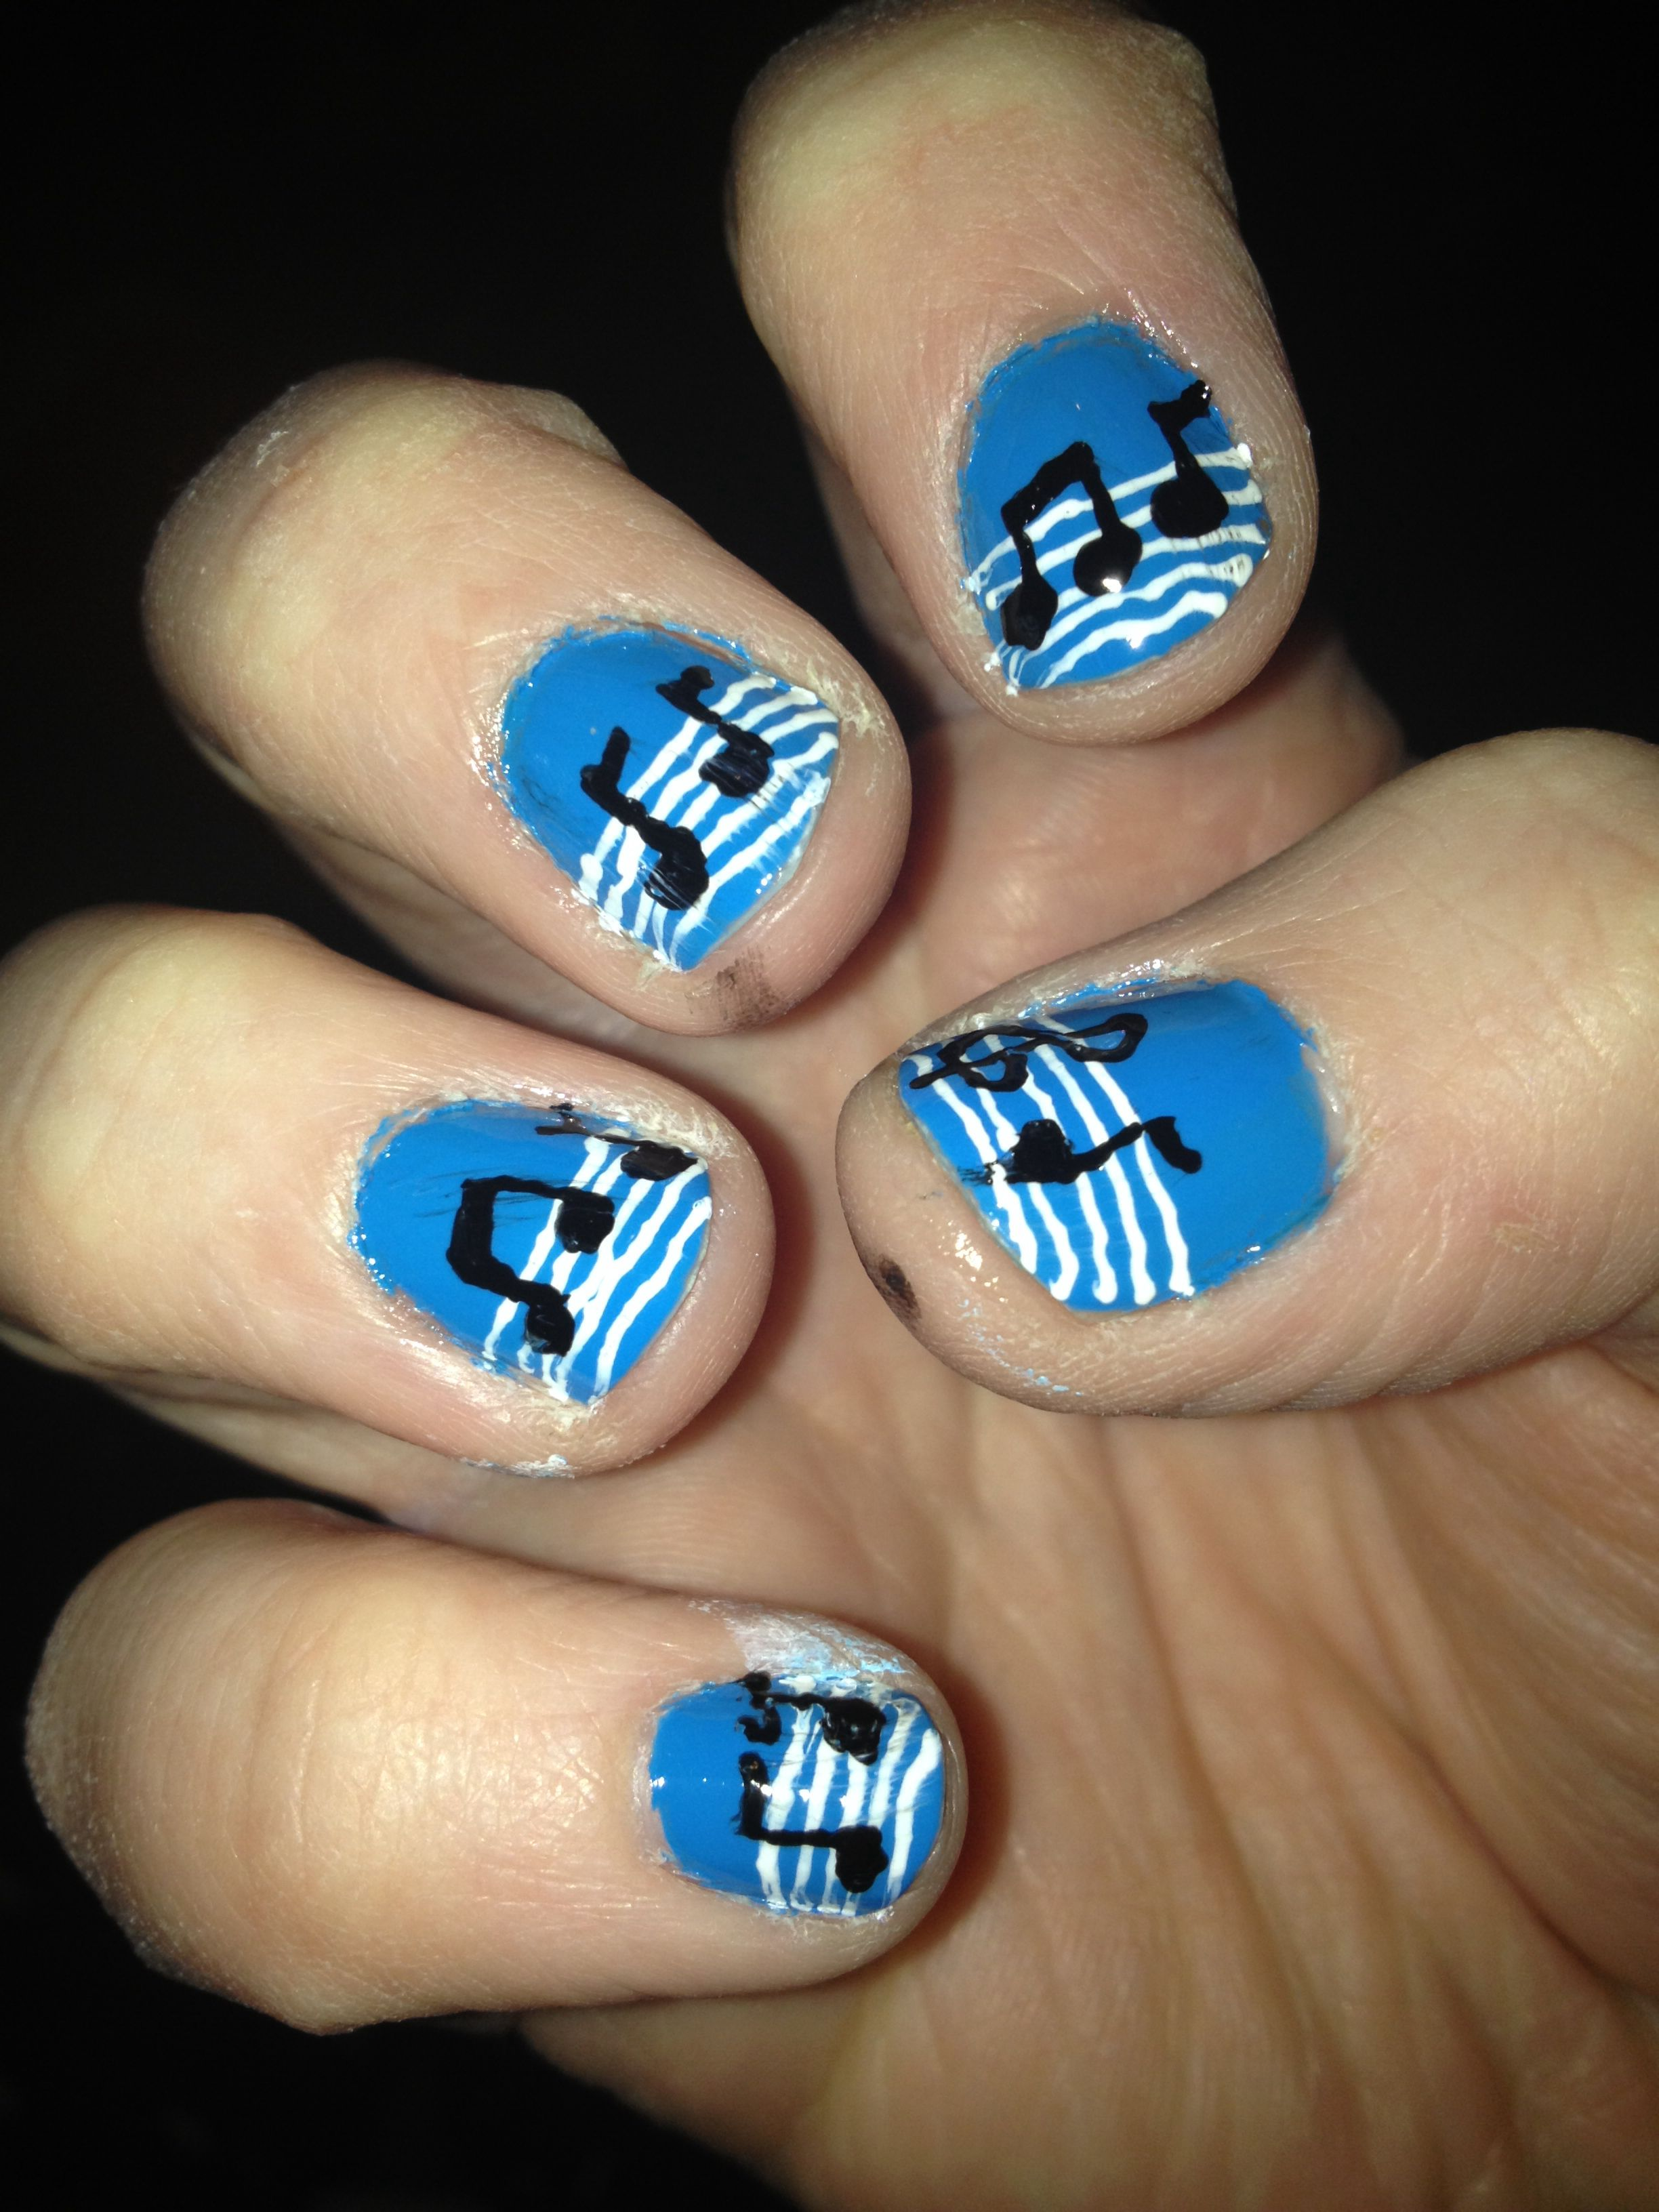 Music As Nail Design Inspiration Httpeasynaildesignscool